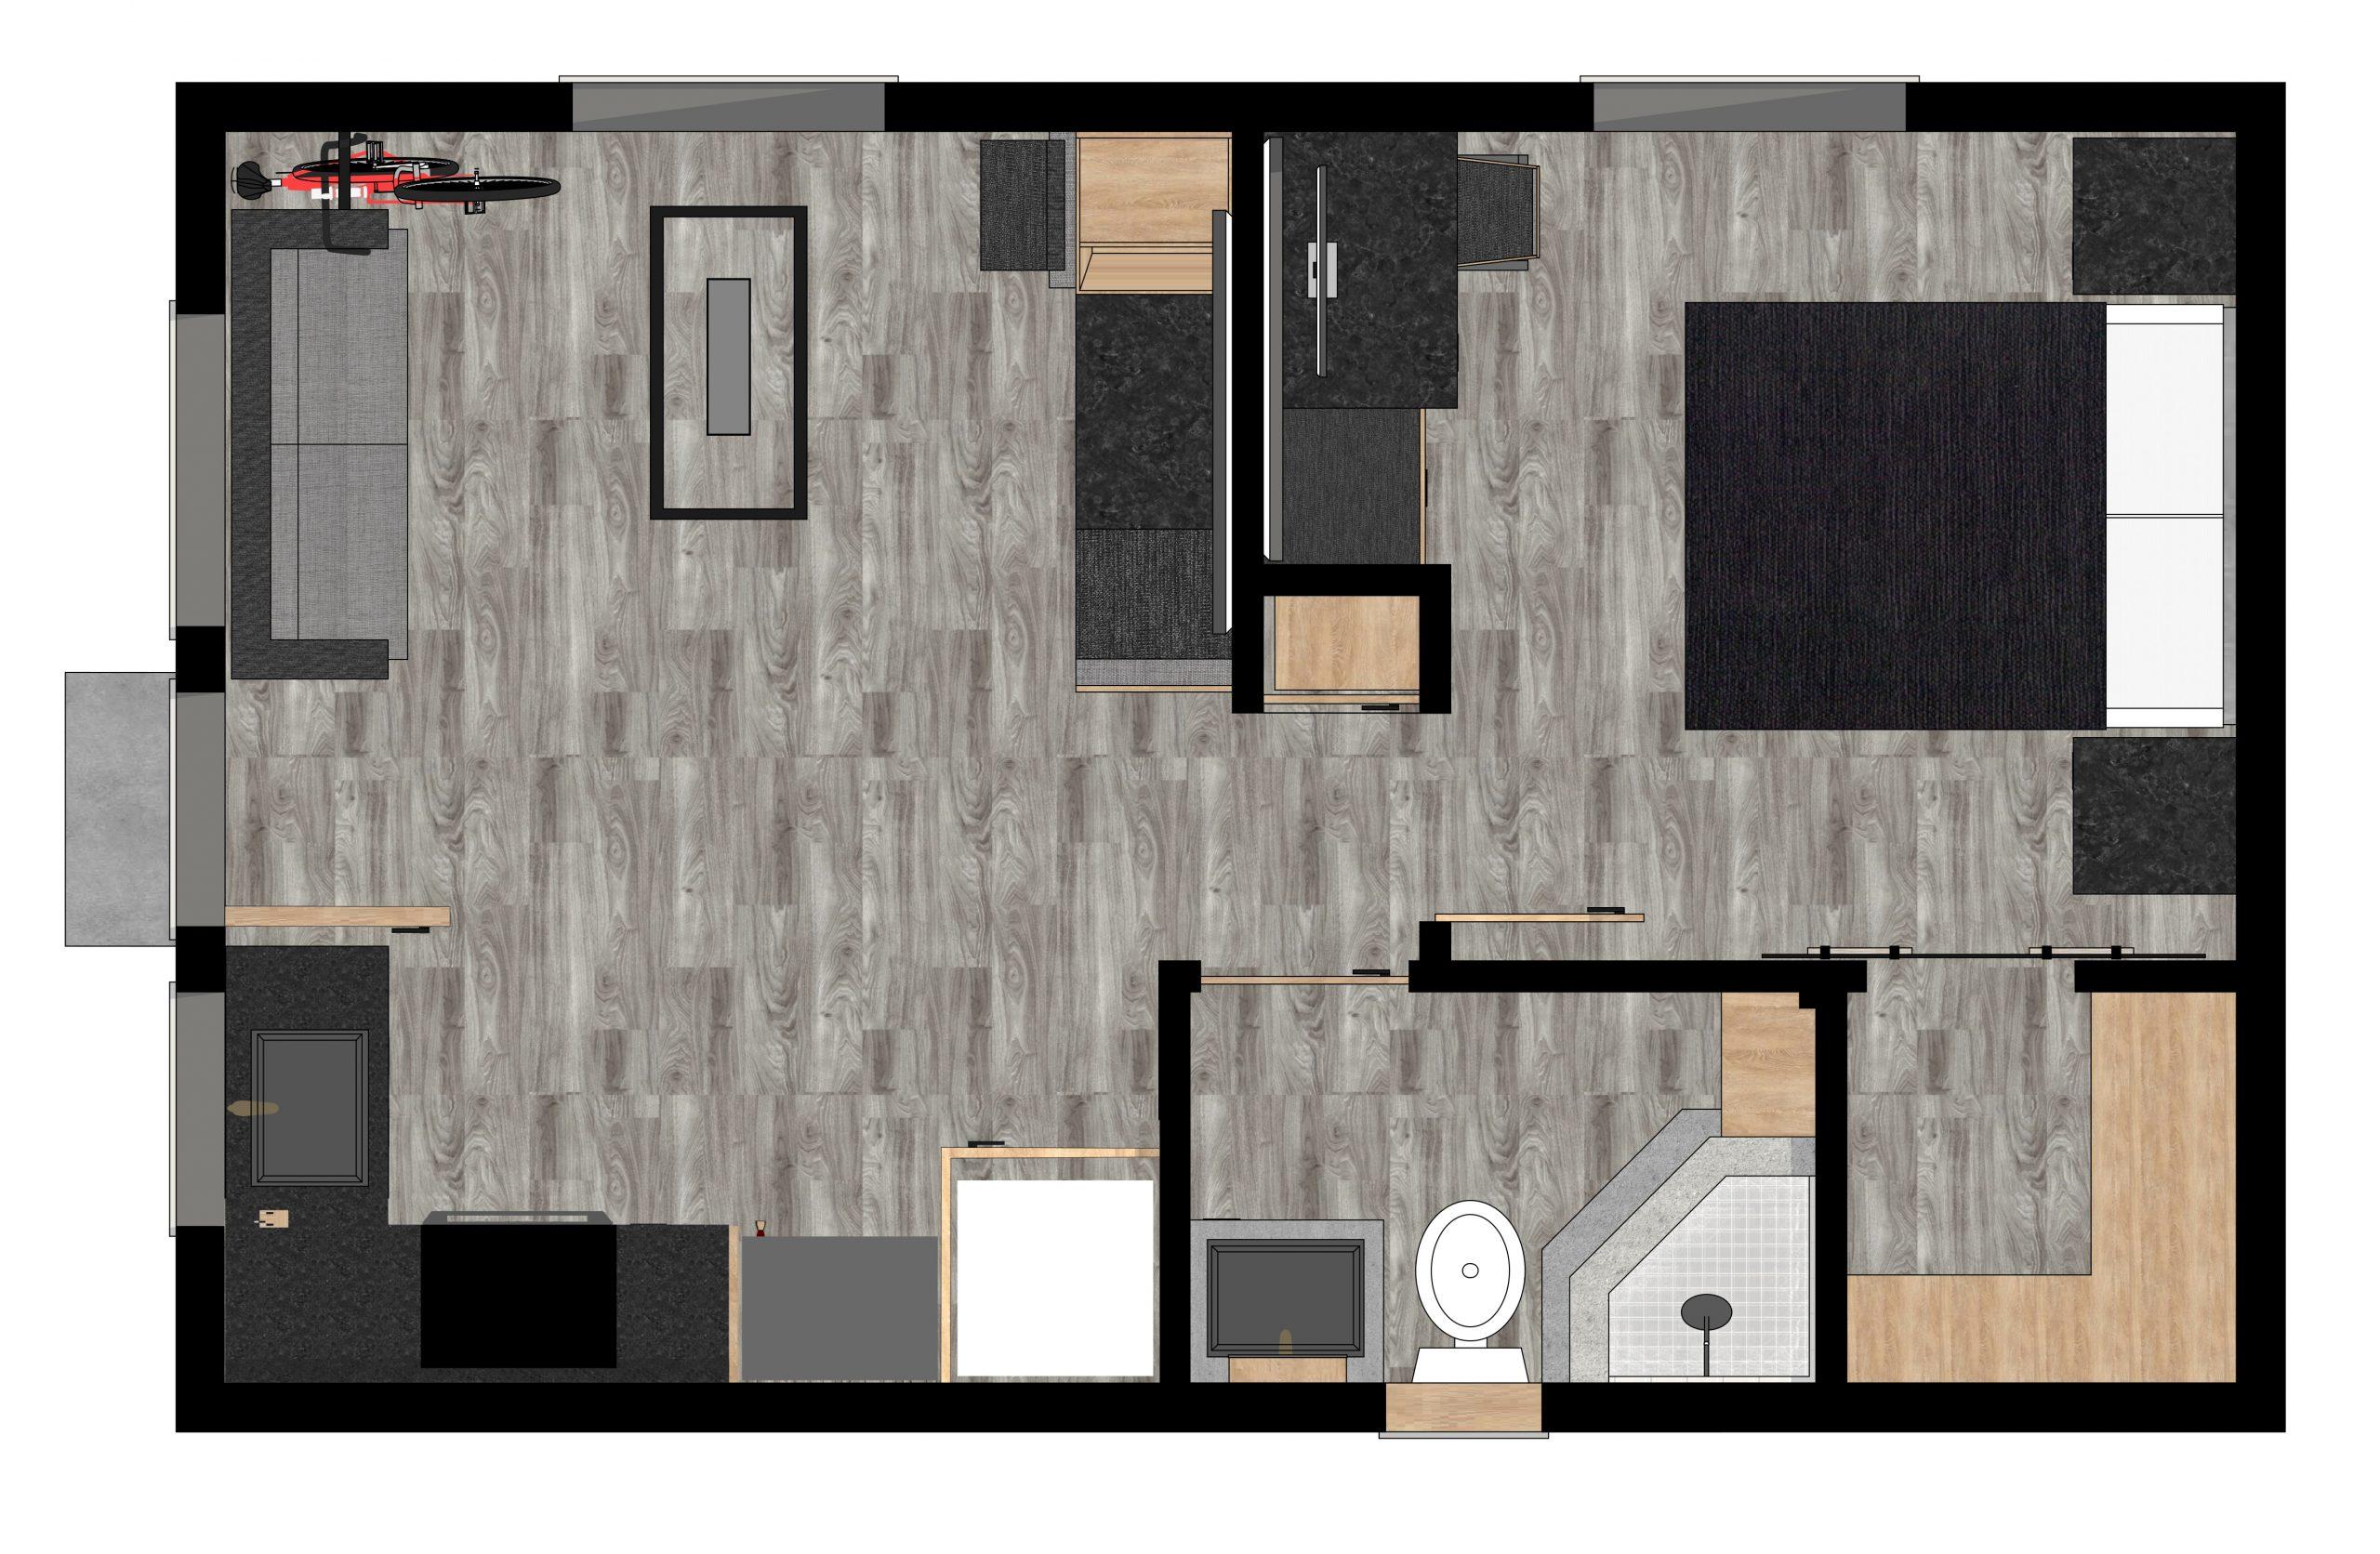 500 sq ft. ADU Project